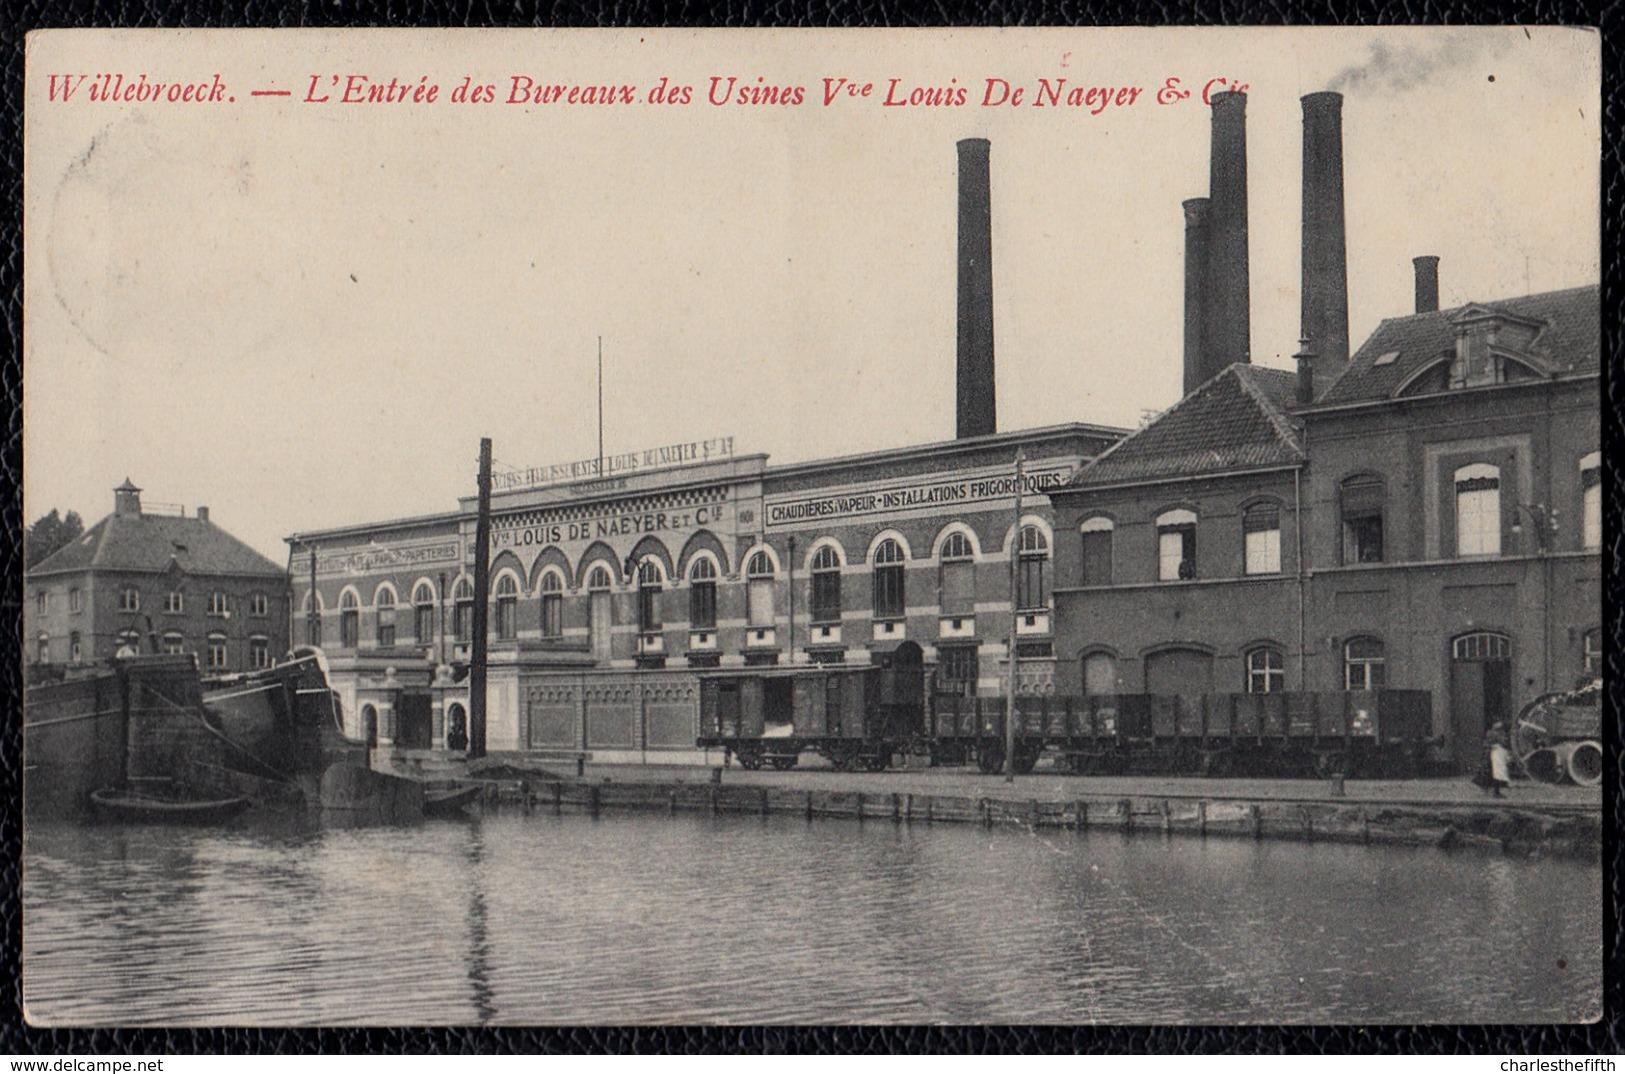 Willebroeck - Willebroek - Entrée Des Bureaux Des Usines Louis De Naeyer Et Cie - Animatie - Train - RARE - Willebroek